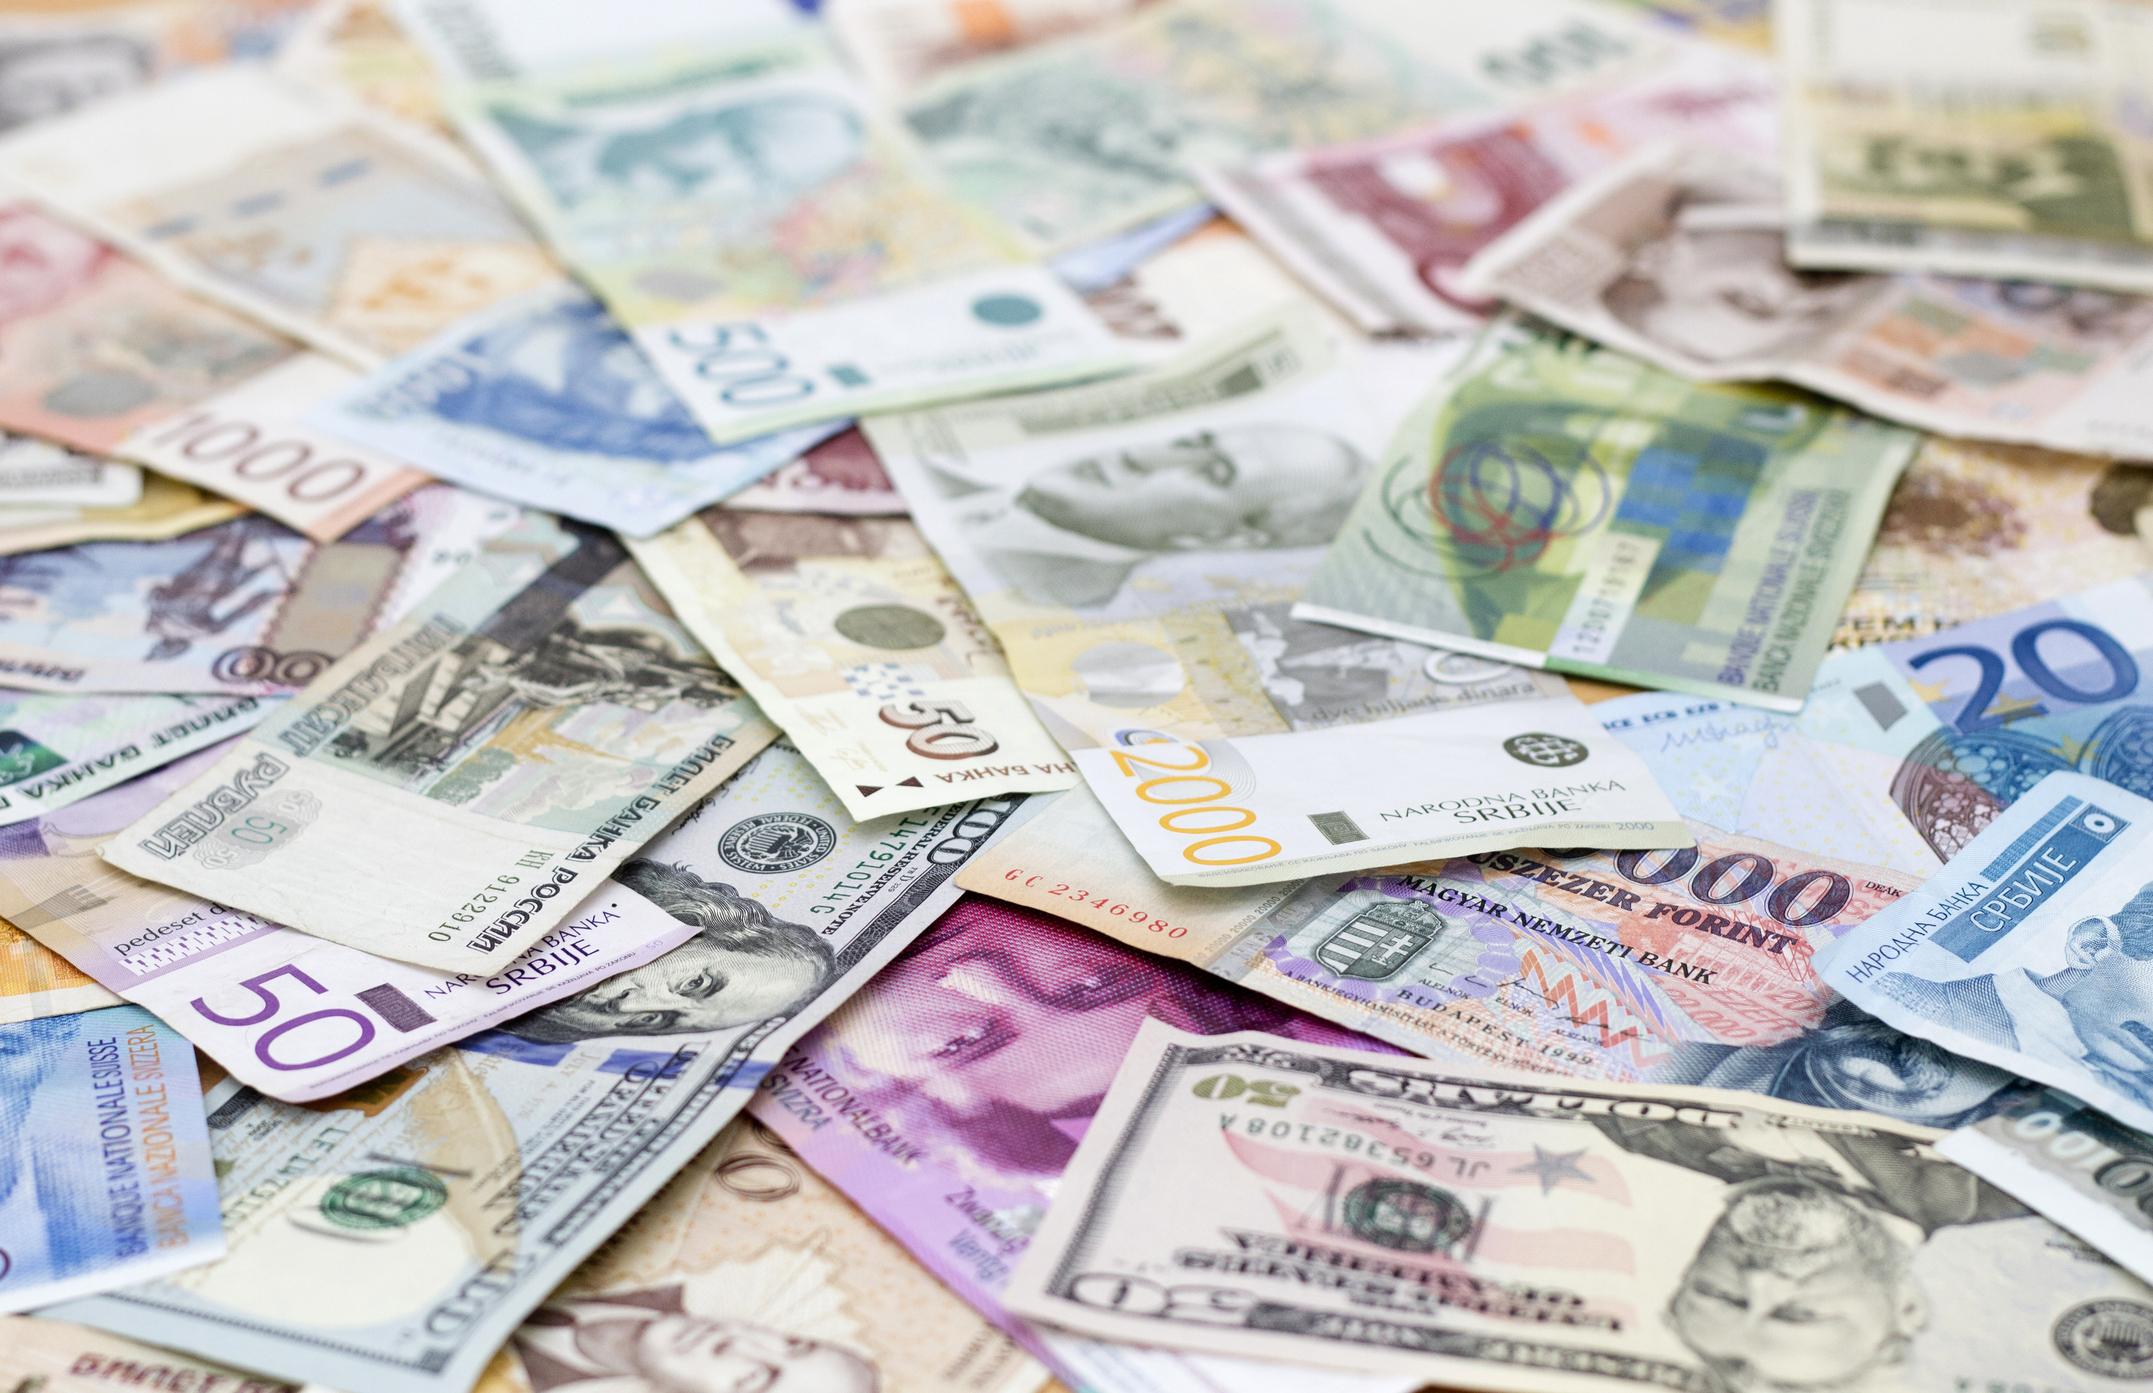 Foreign cash.